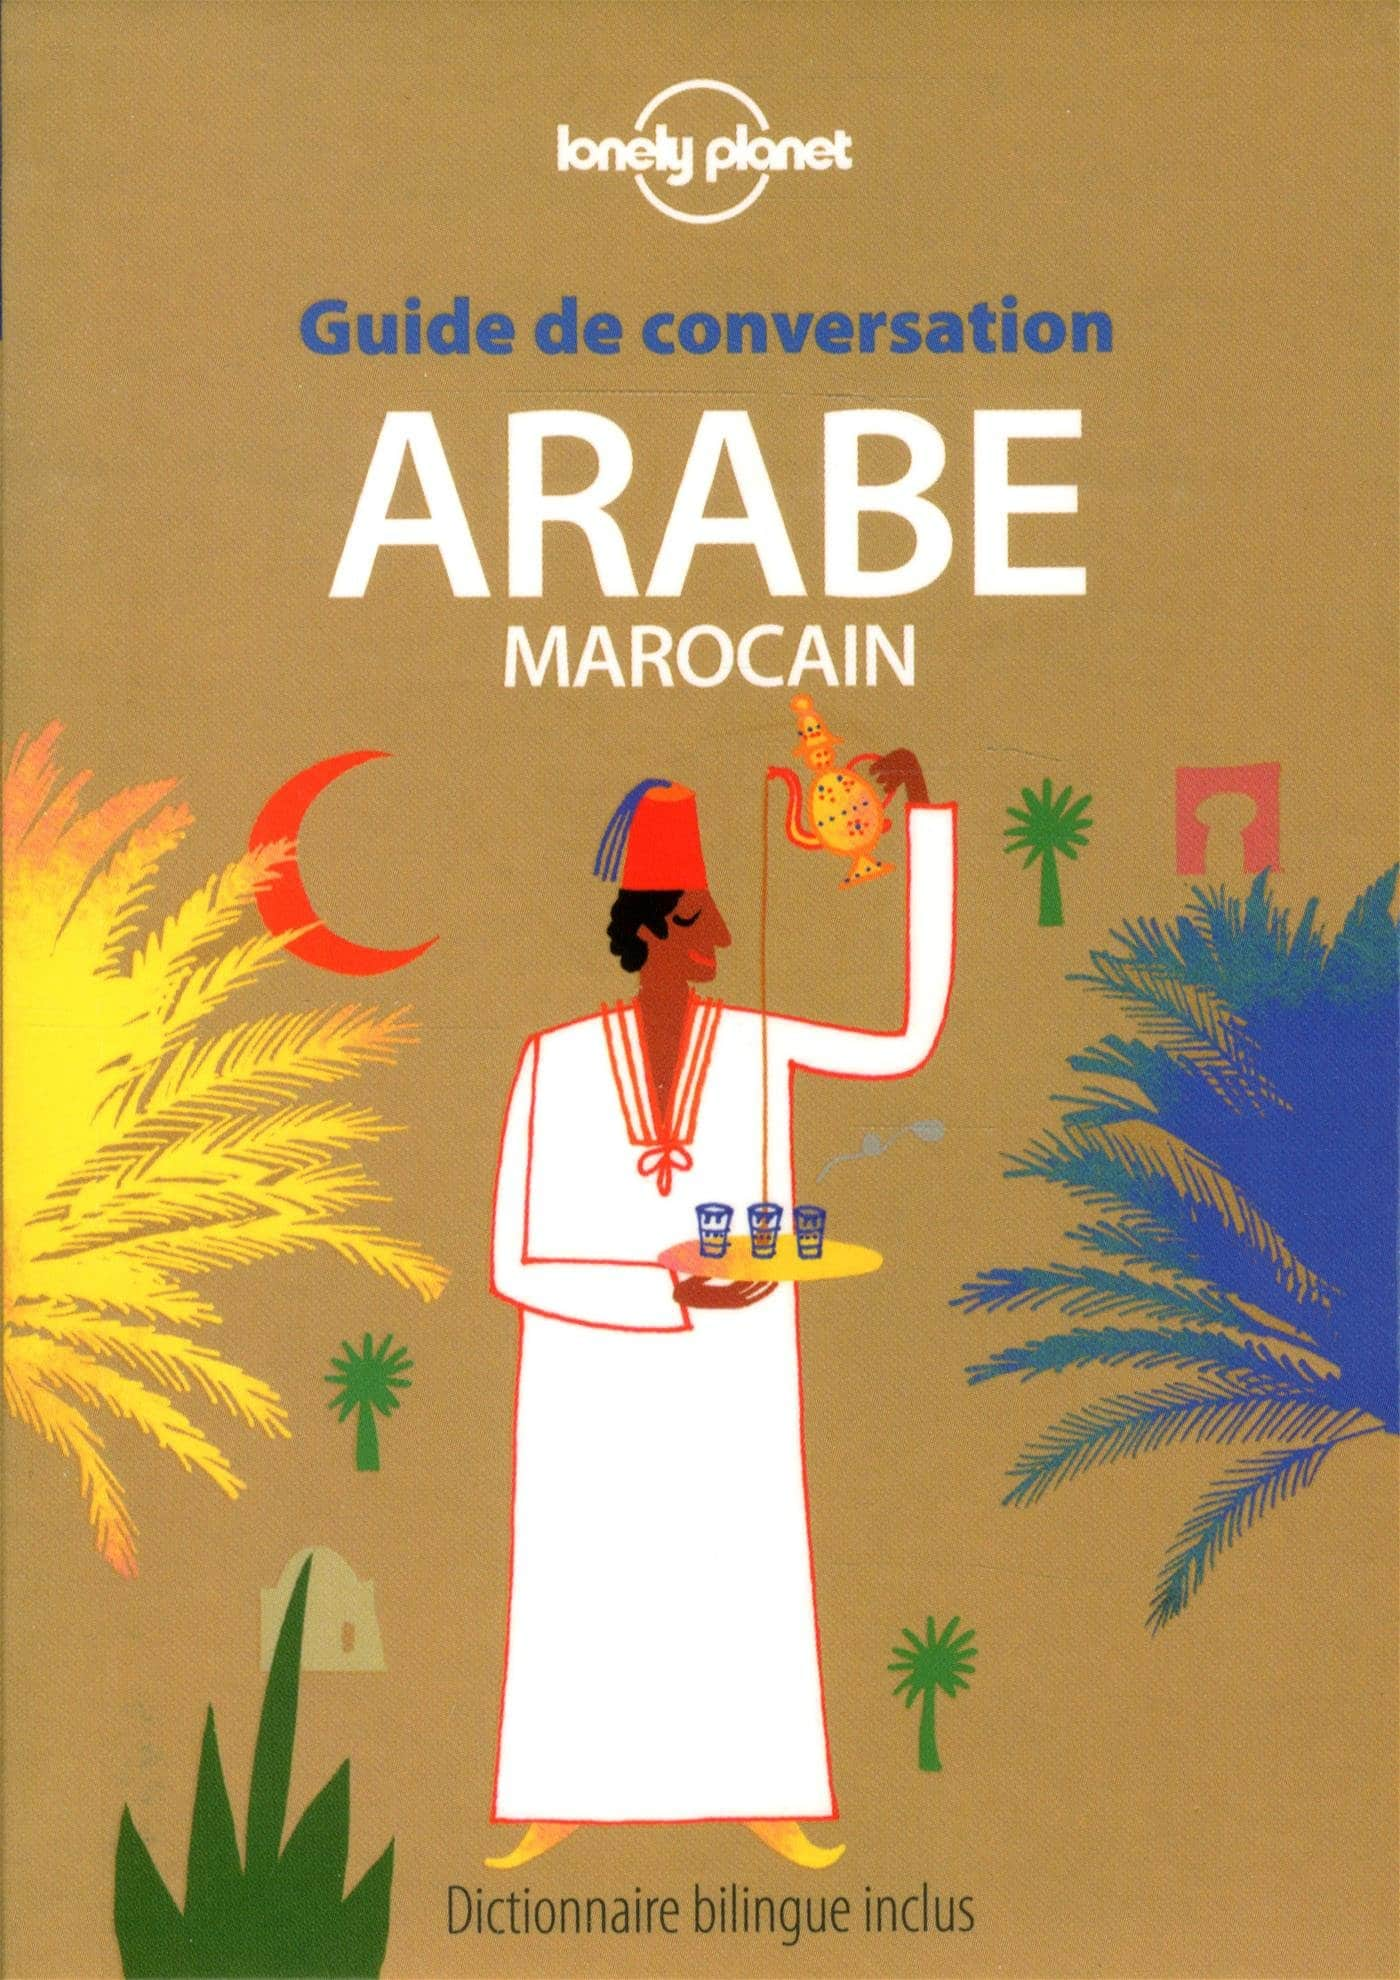 volontariat humanitaire au maroc volontariat international au maroc missions humanitaires au maroc